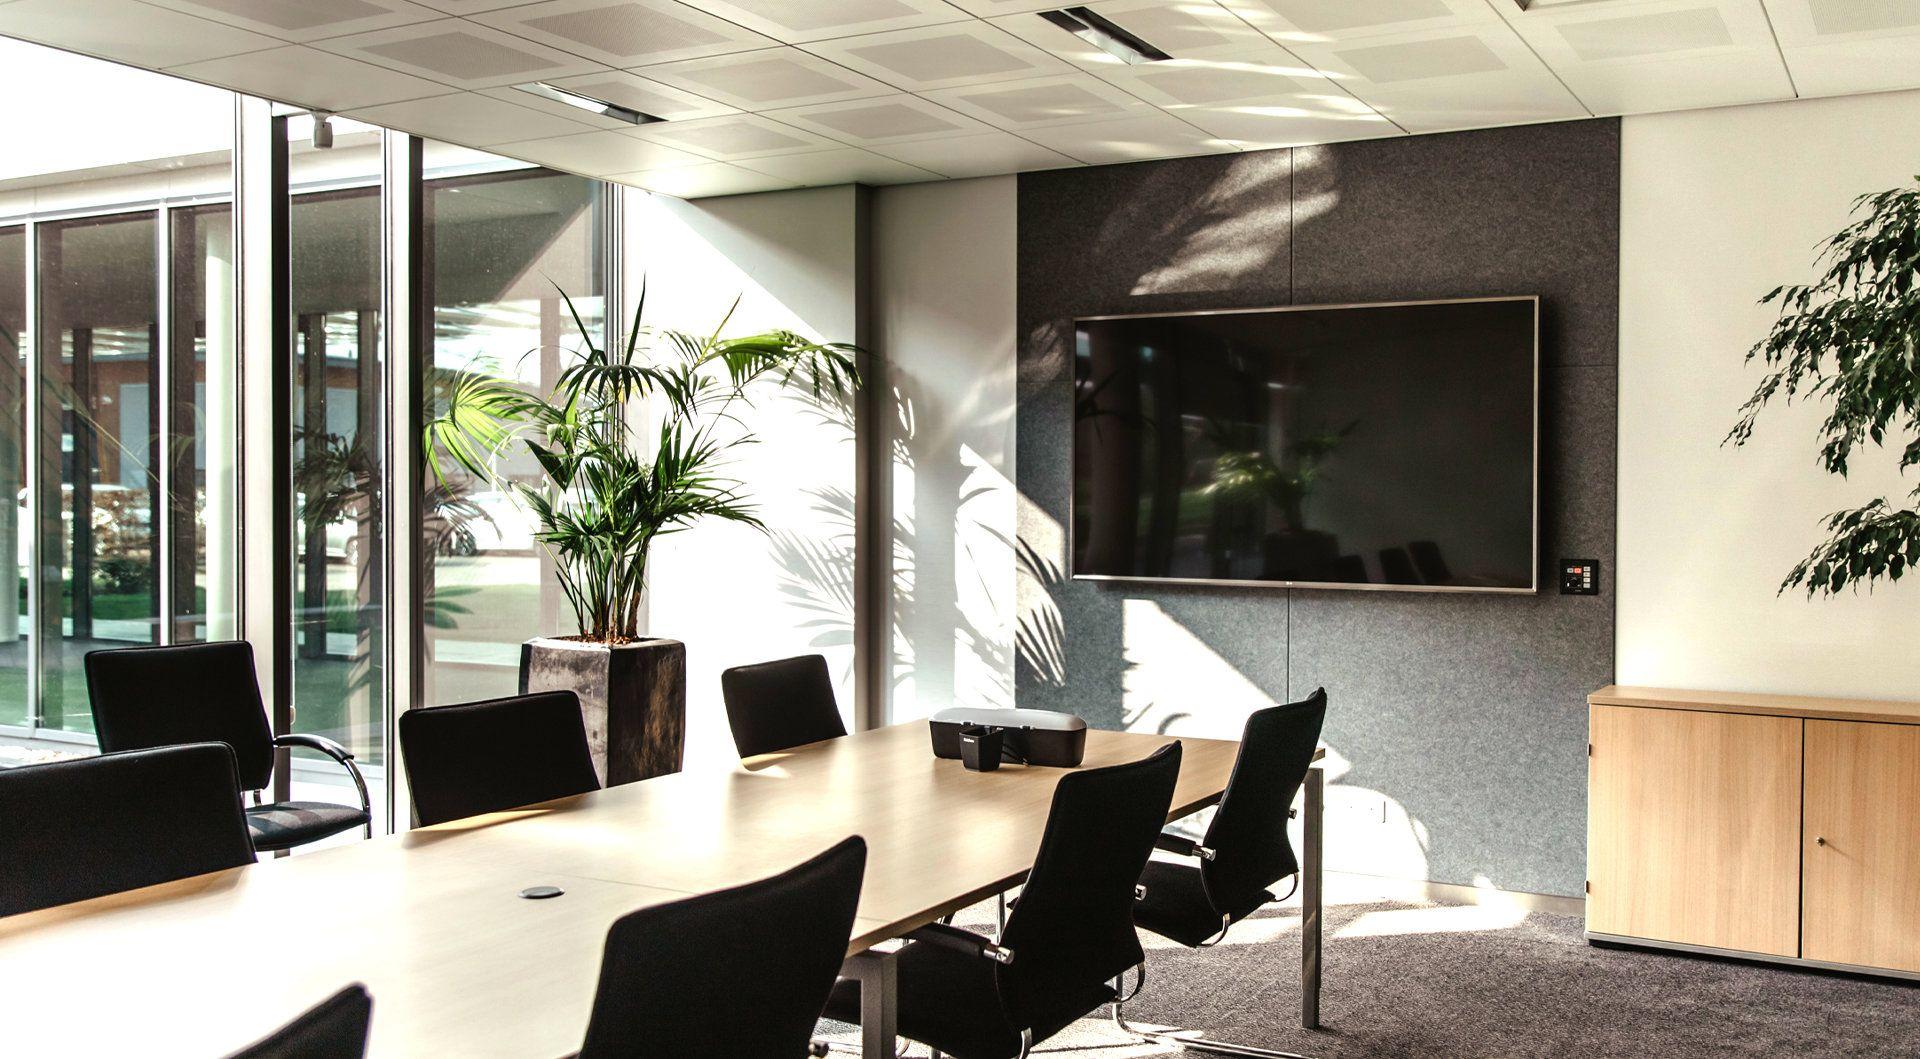 "LG 55XS4F beeldkrant 139,7 cm (55"") LED Full HD Digitale signage flatscreen Zwart - Case studie de vries"